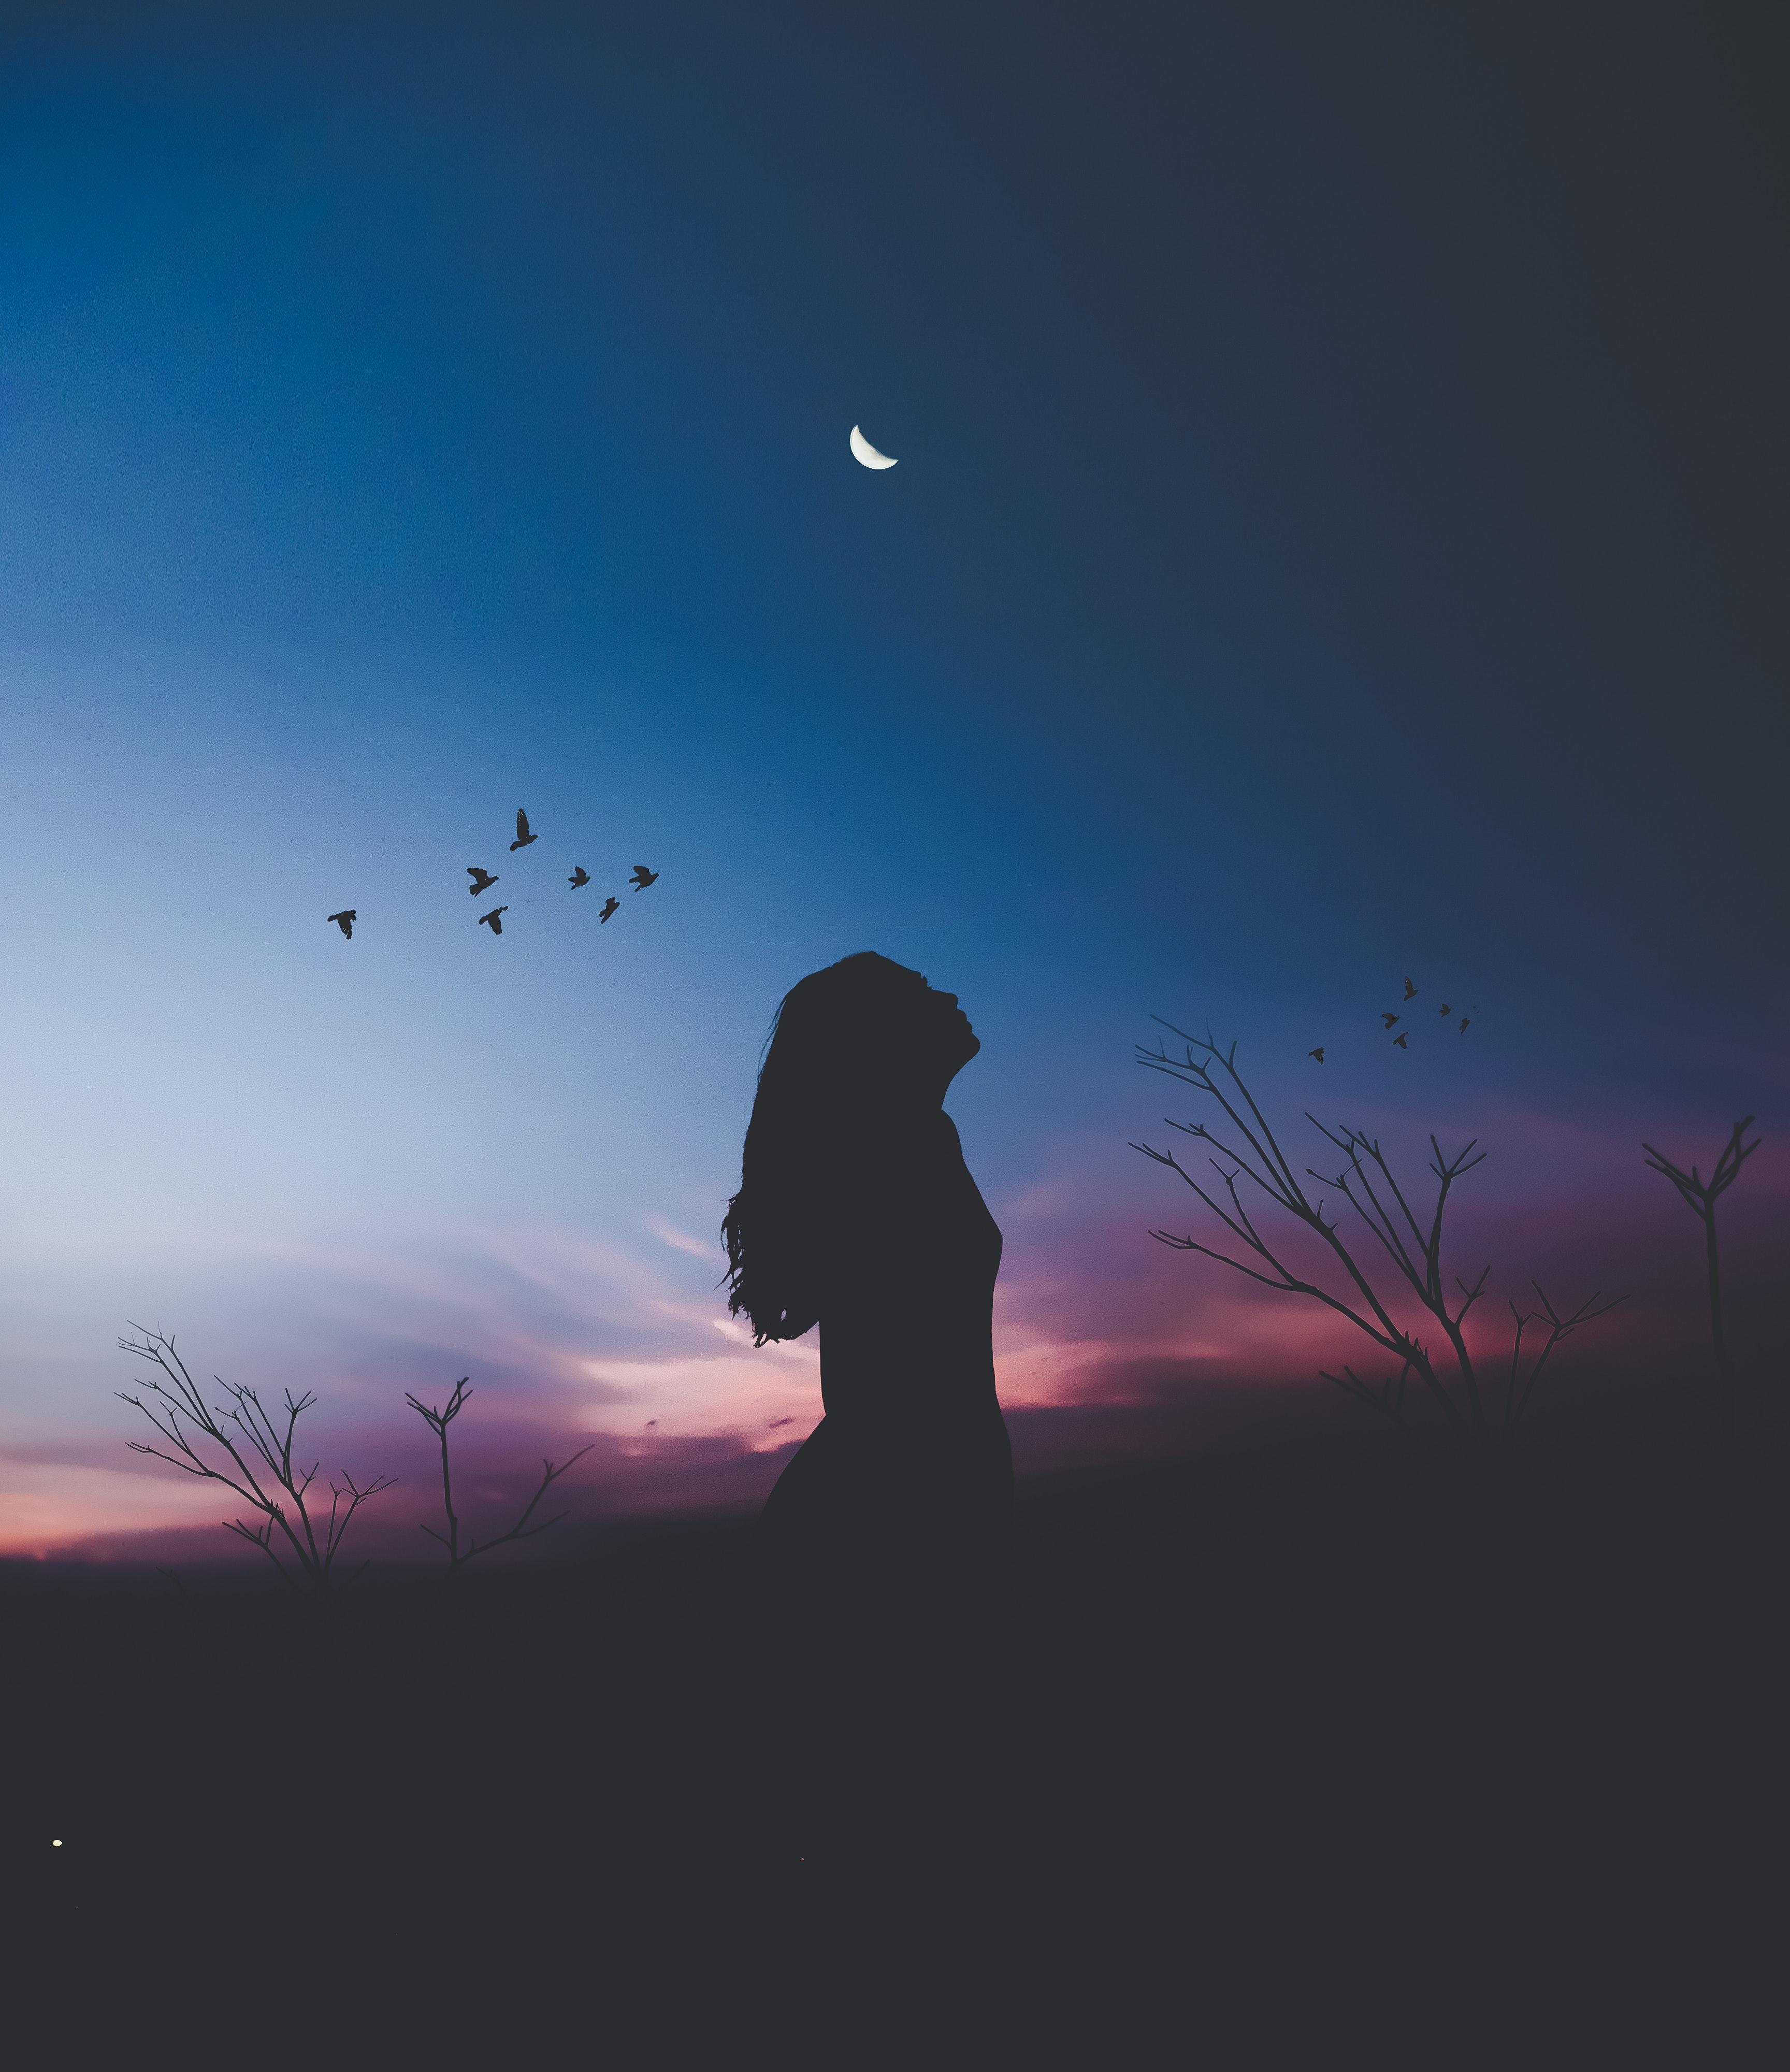 Girl Silhouette Shadow Birds Flying, HD Photography, 4k